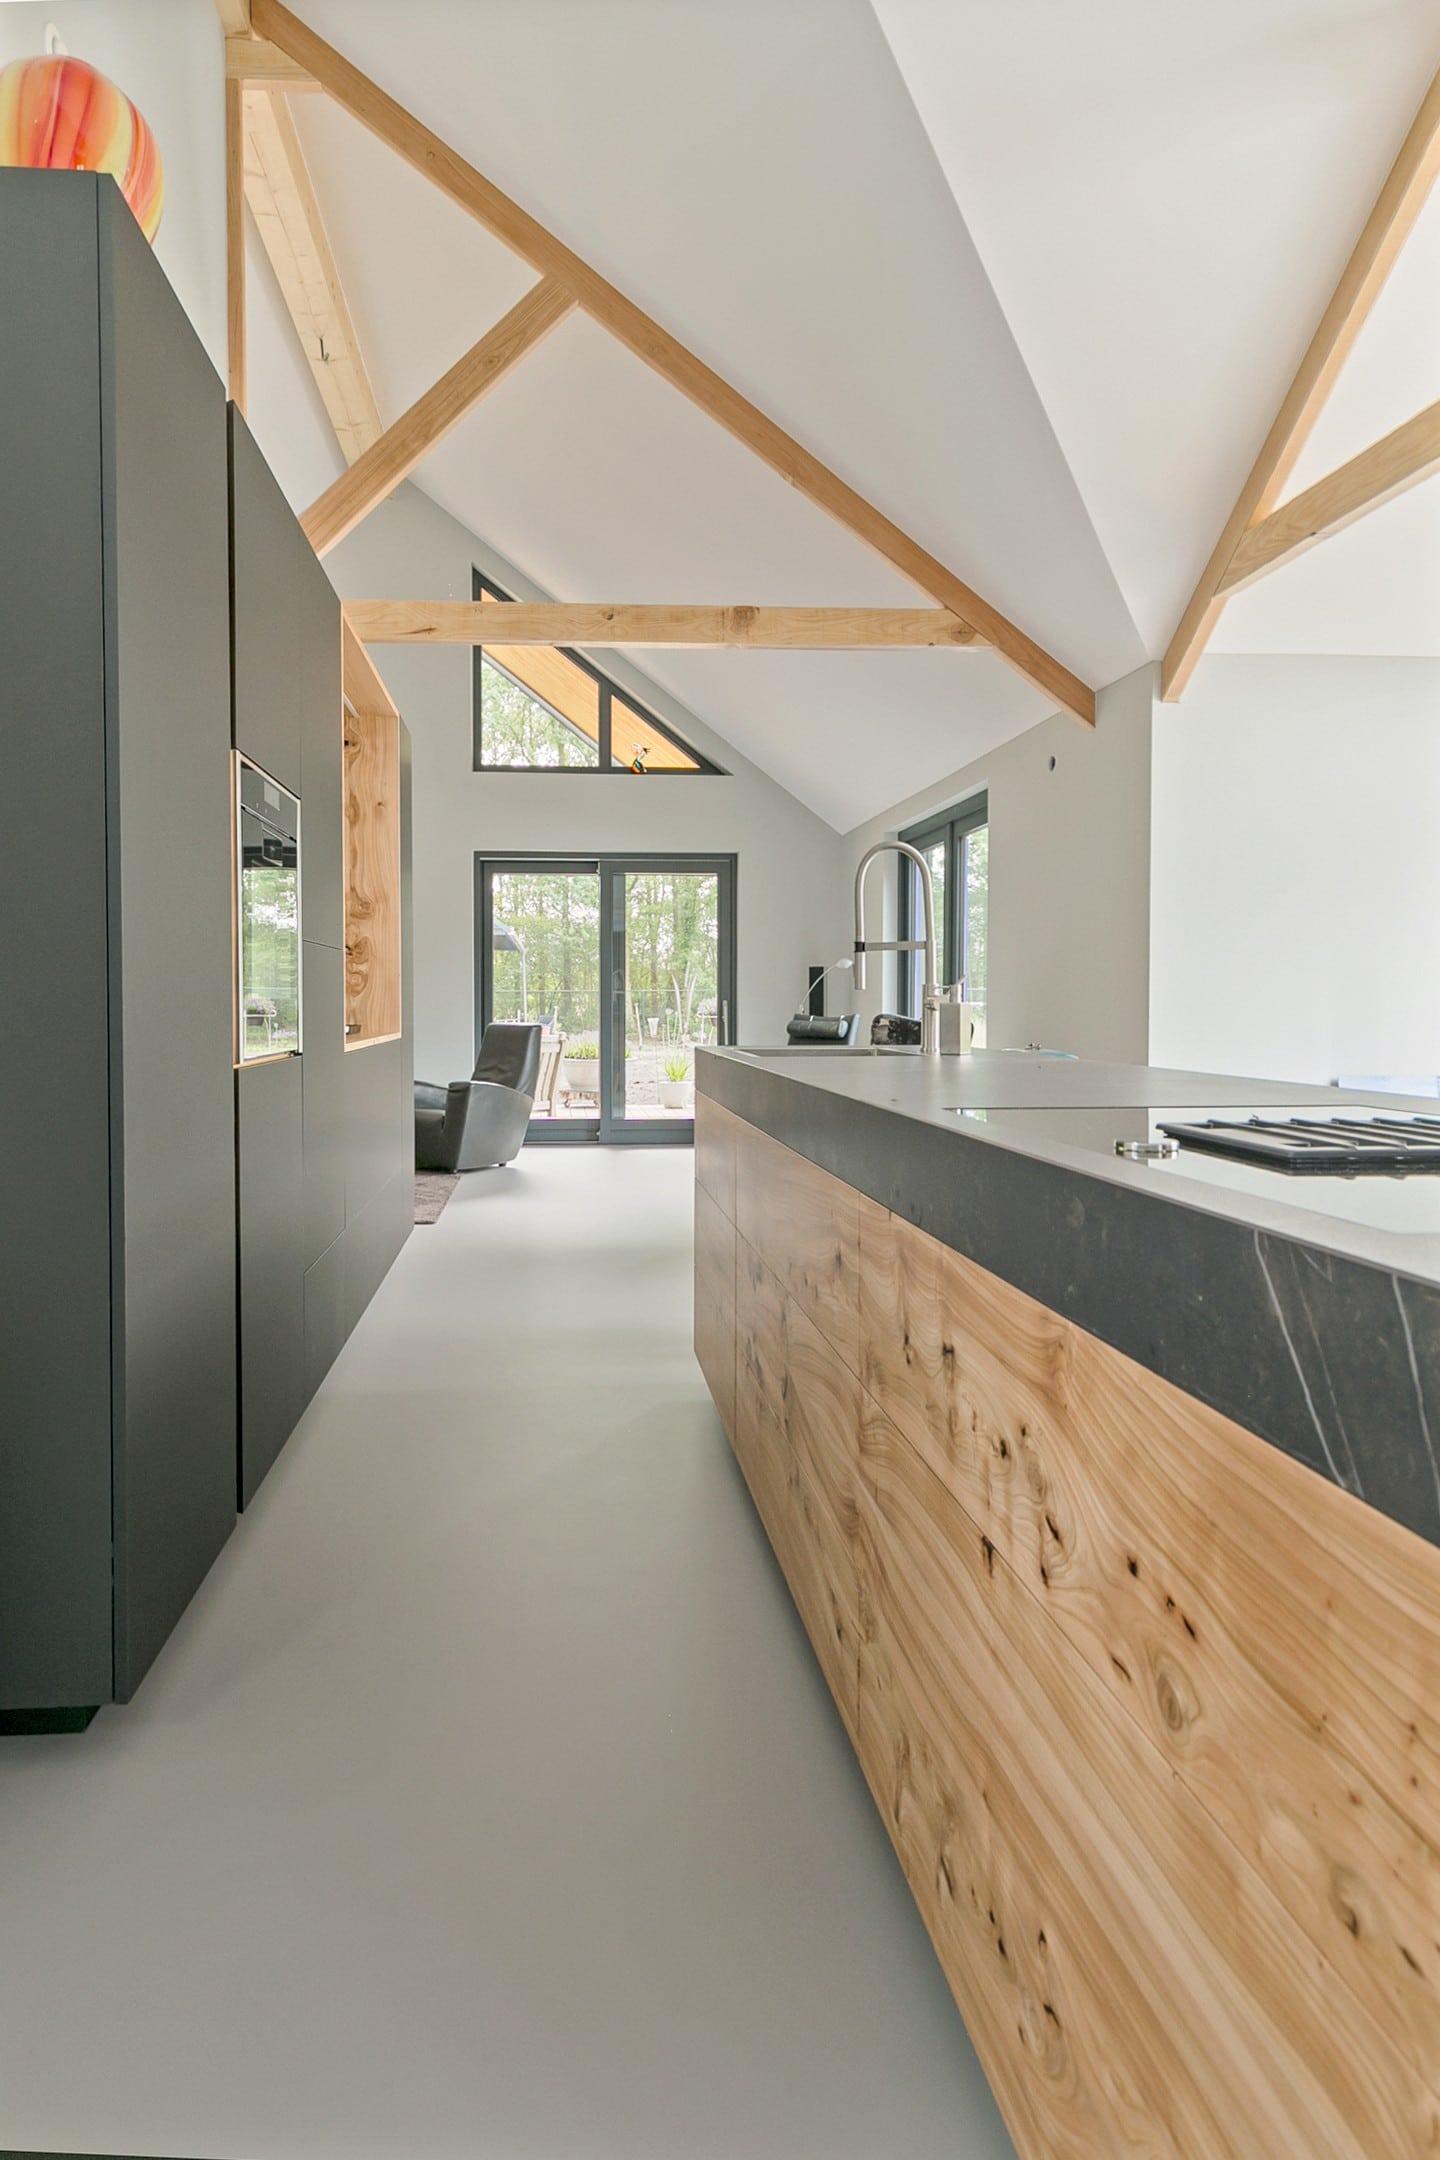 Keuken in de woning